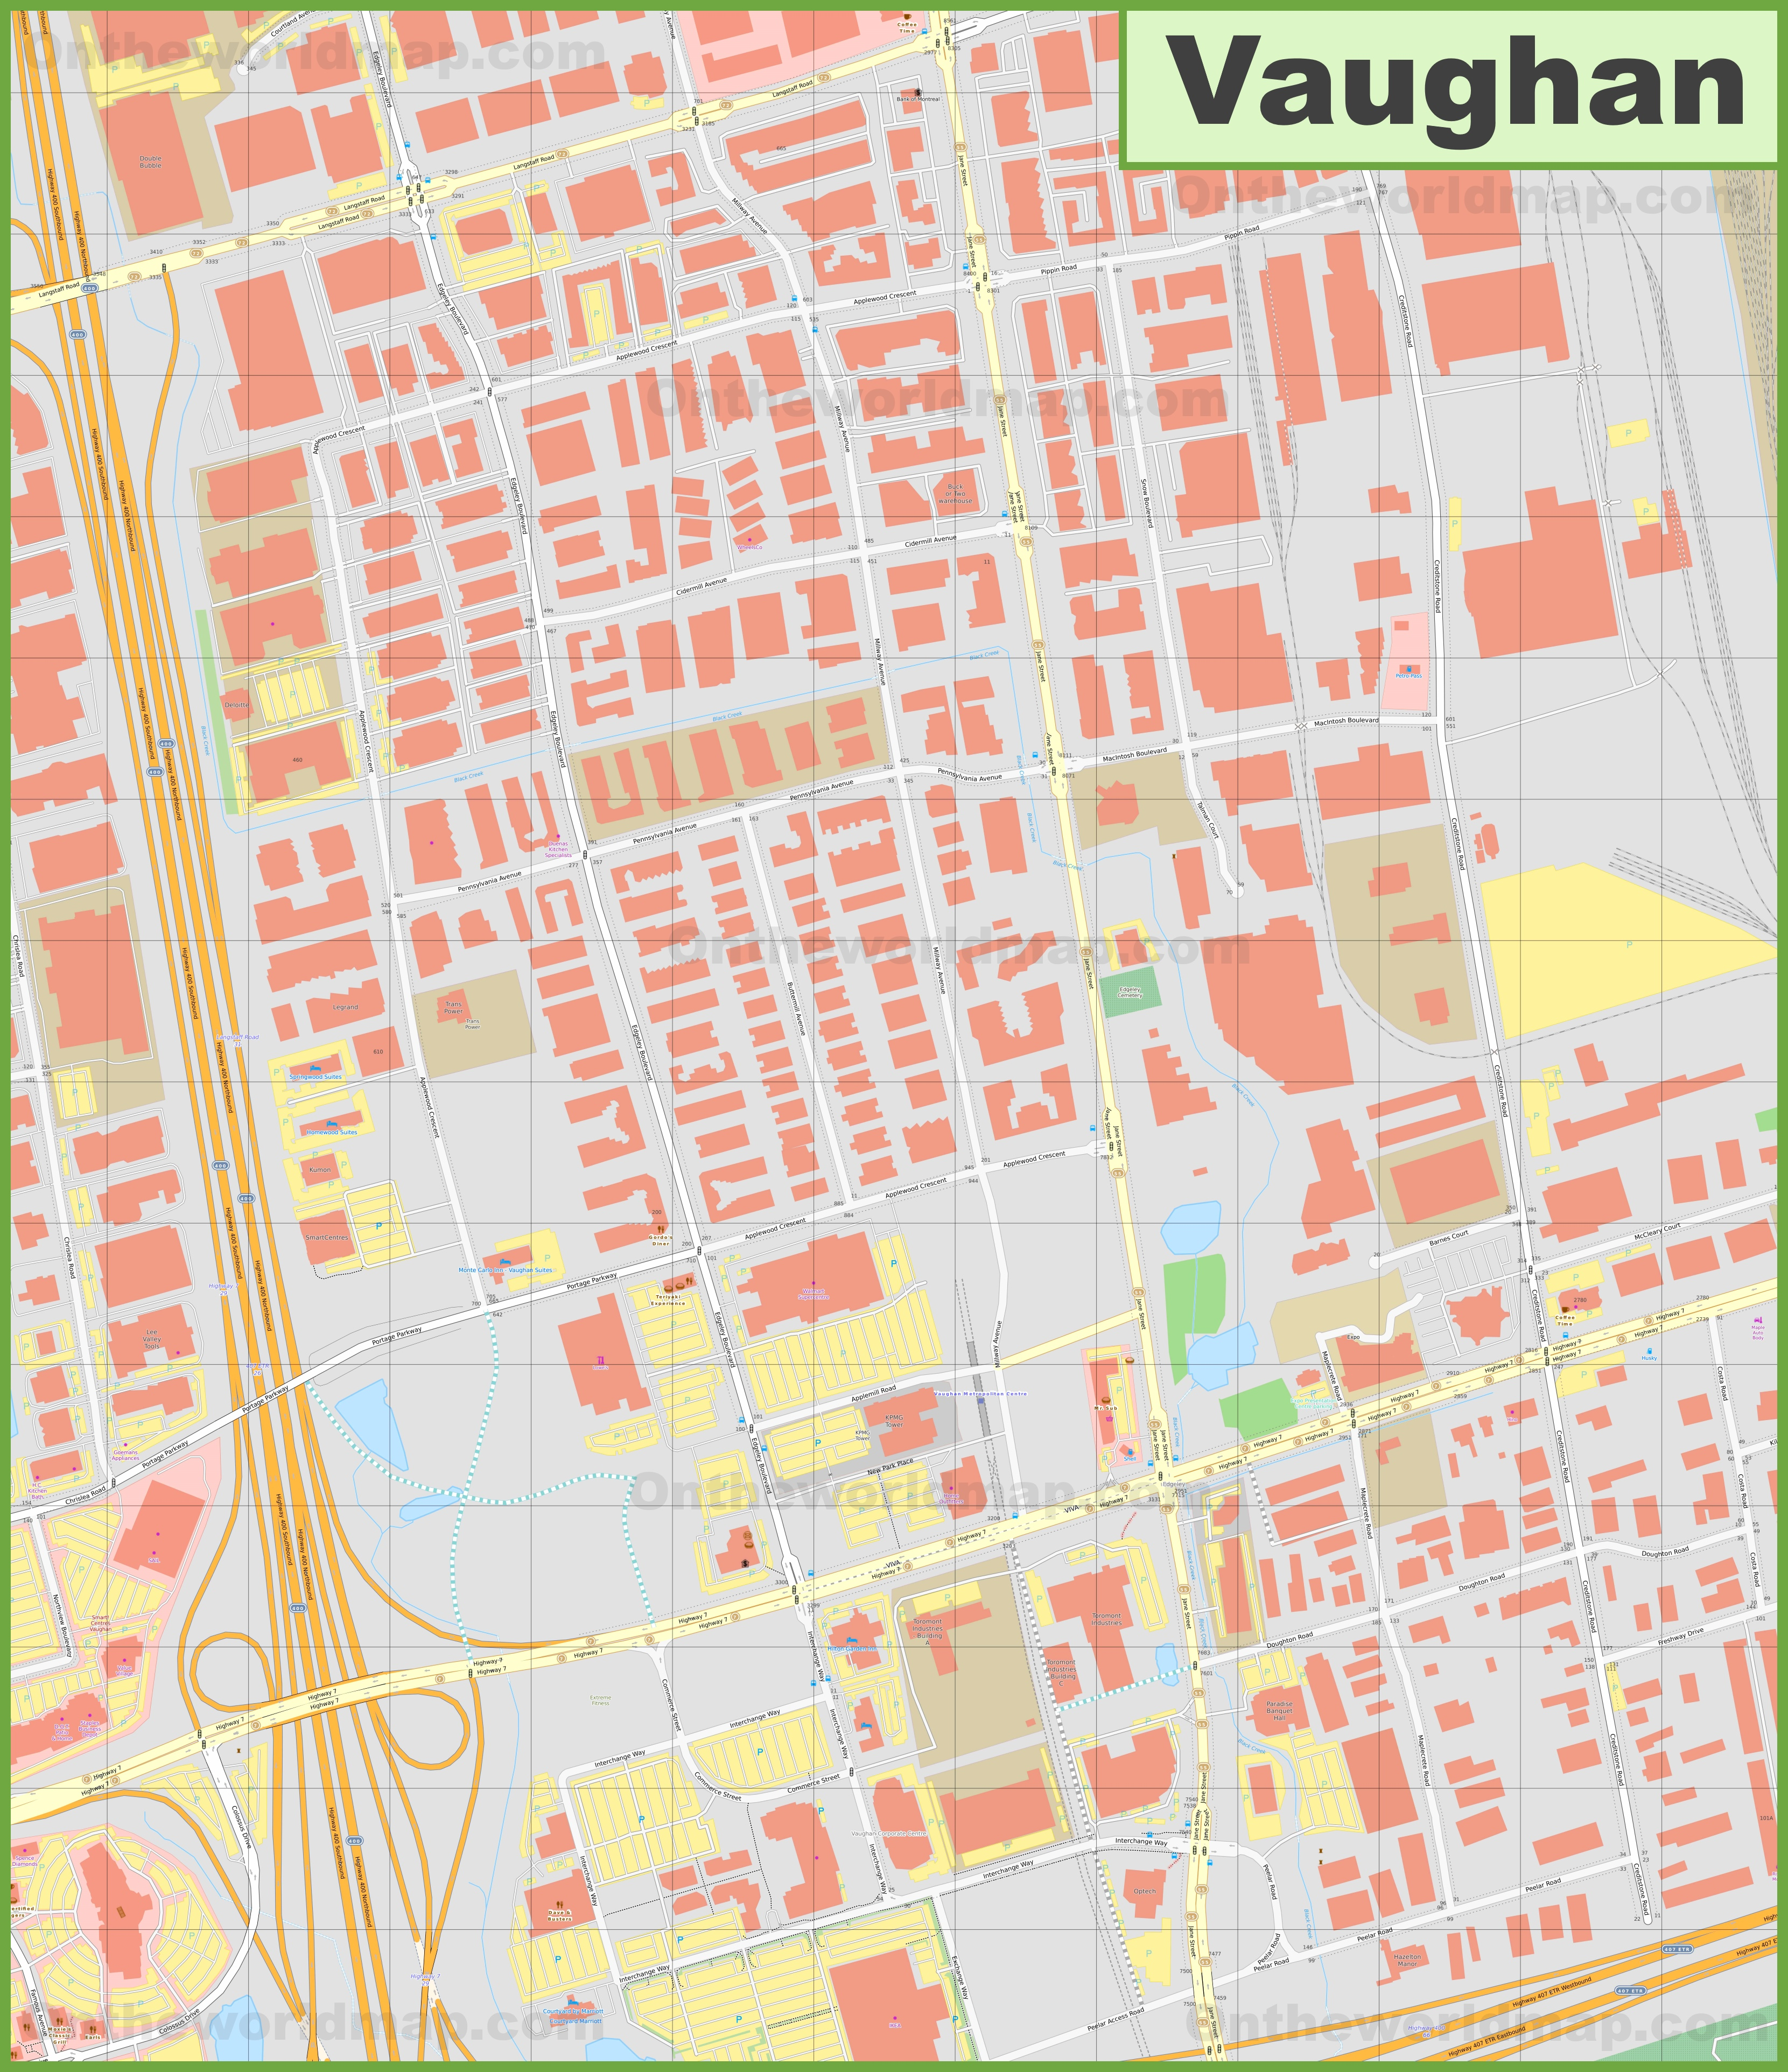 Vaughan downtown map